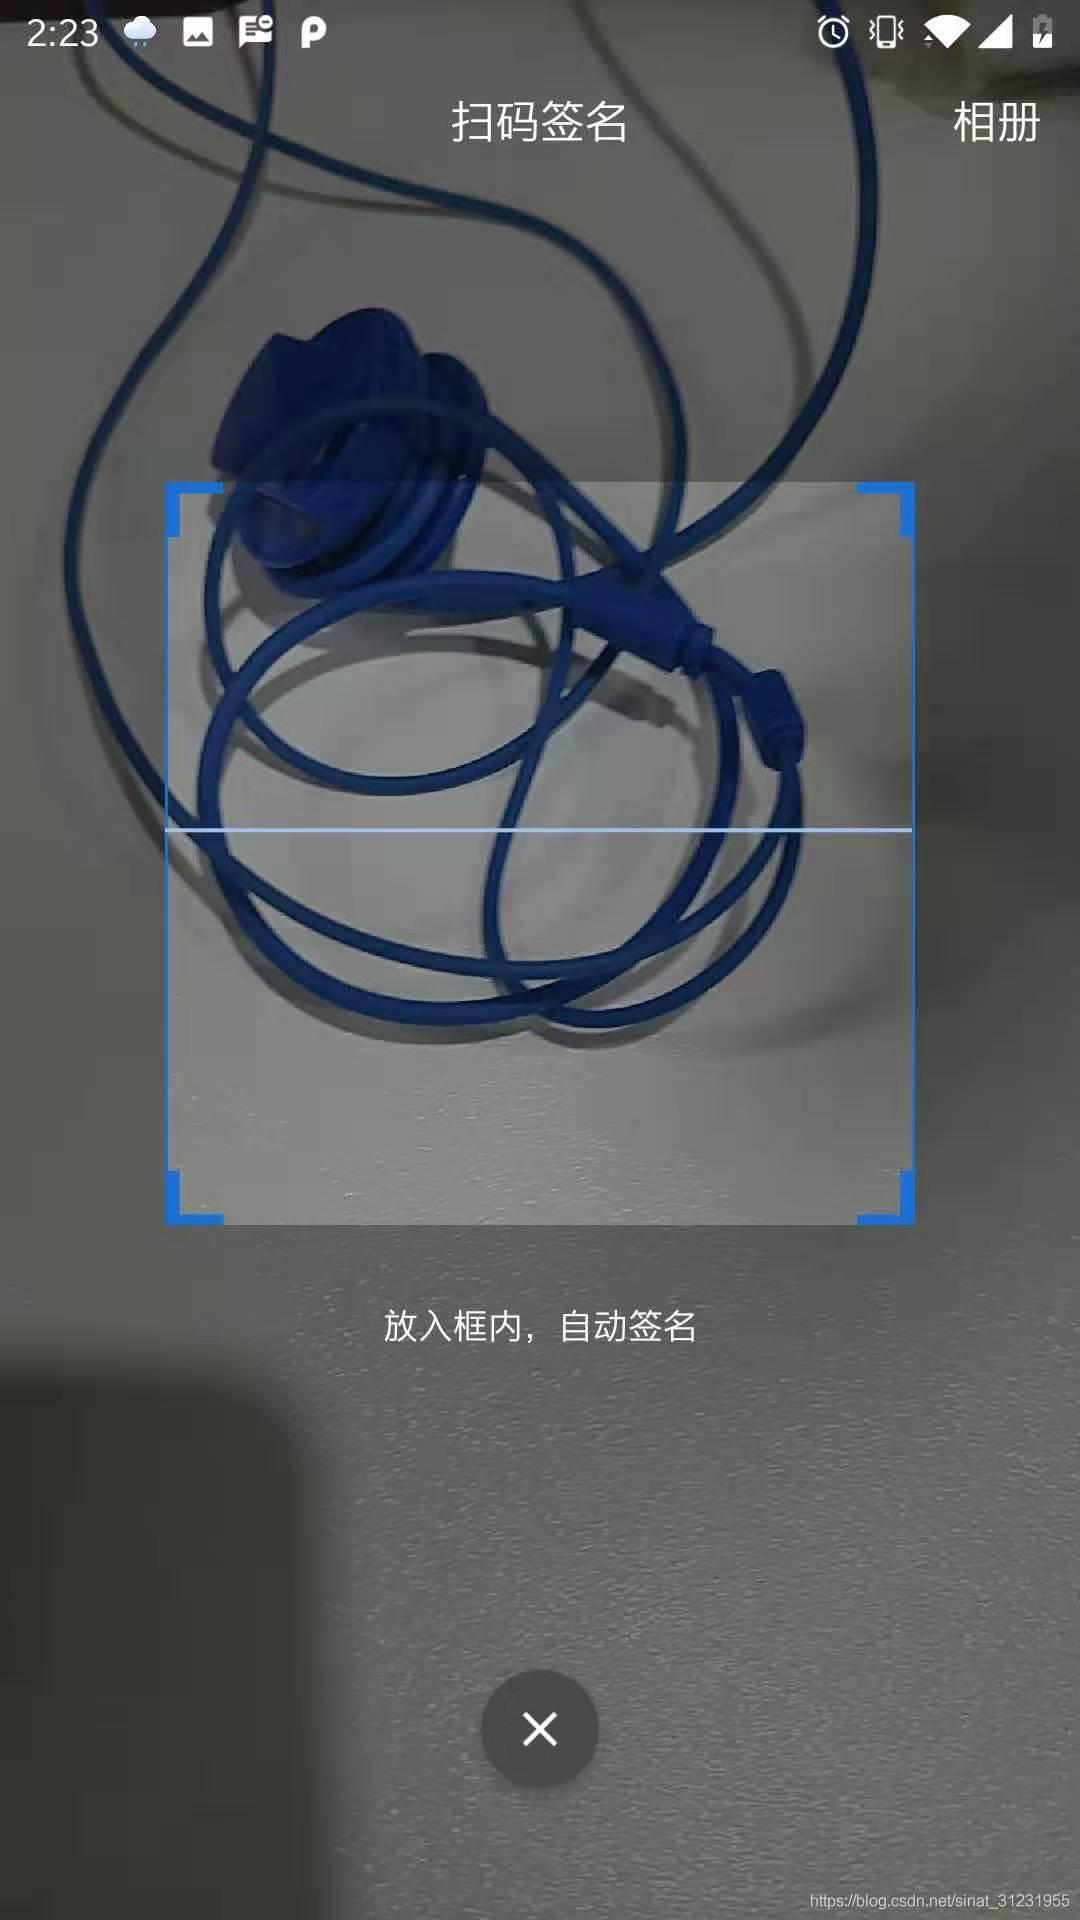 ](https://img-blog.csdnimg.cn/20190302122736533.jpg?x-oss-process=image/watermark,type_ZmFuZ3poZW5naGVpdGk,shadow_10,text_aHR0cHM6Ly9ibG9nLmNzZG4ubmV0L3NpbmF0XzMxMjMxOTU1,size_16,color_FFFFFF,t_70)